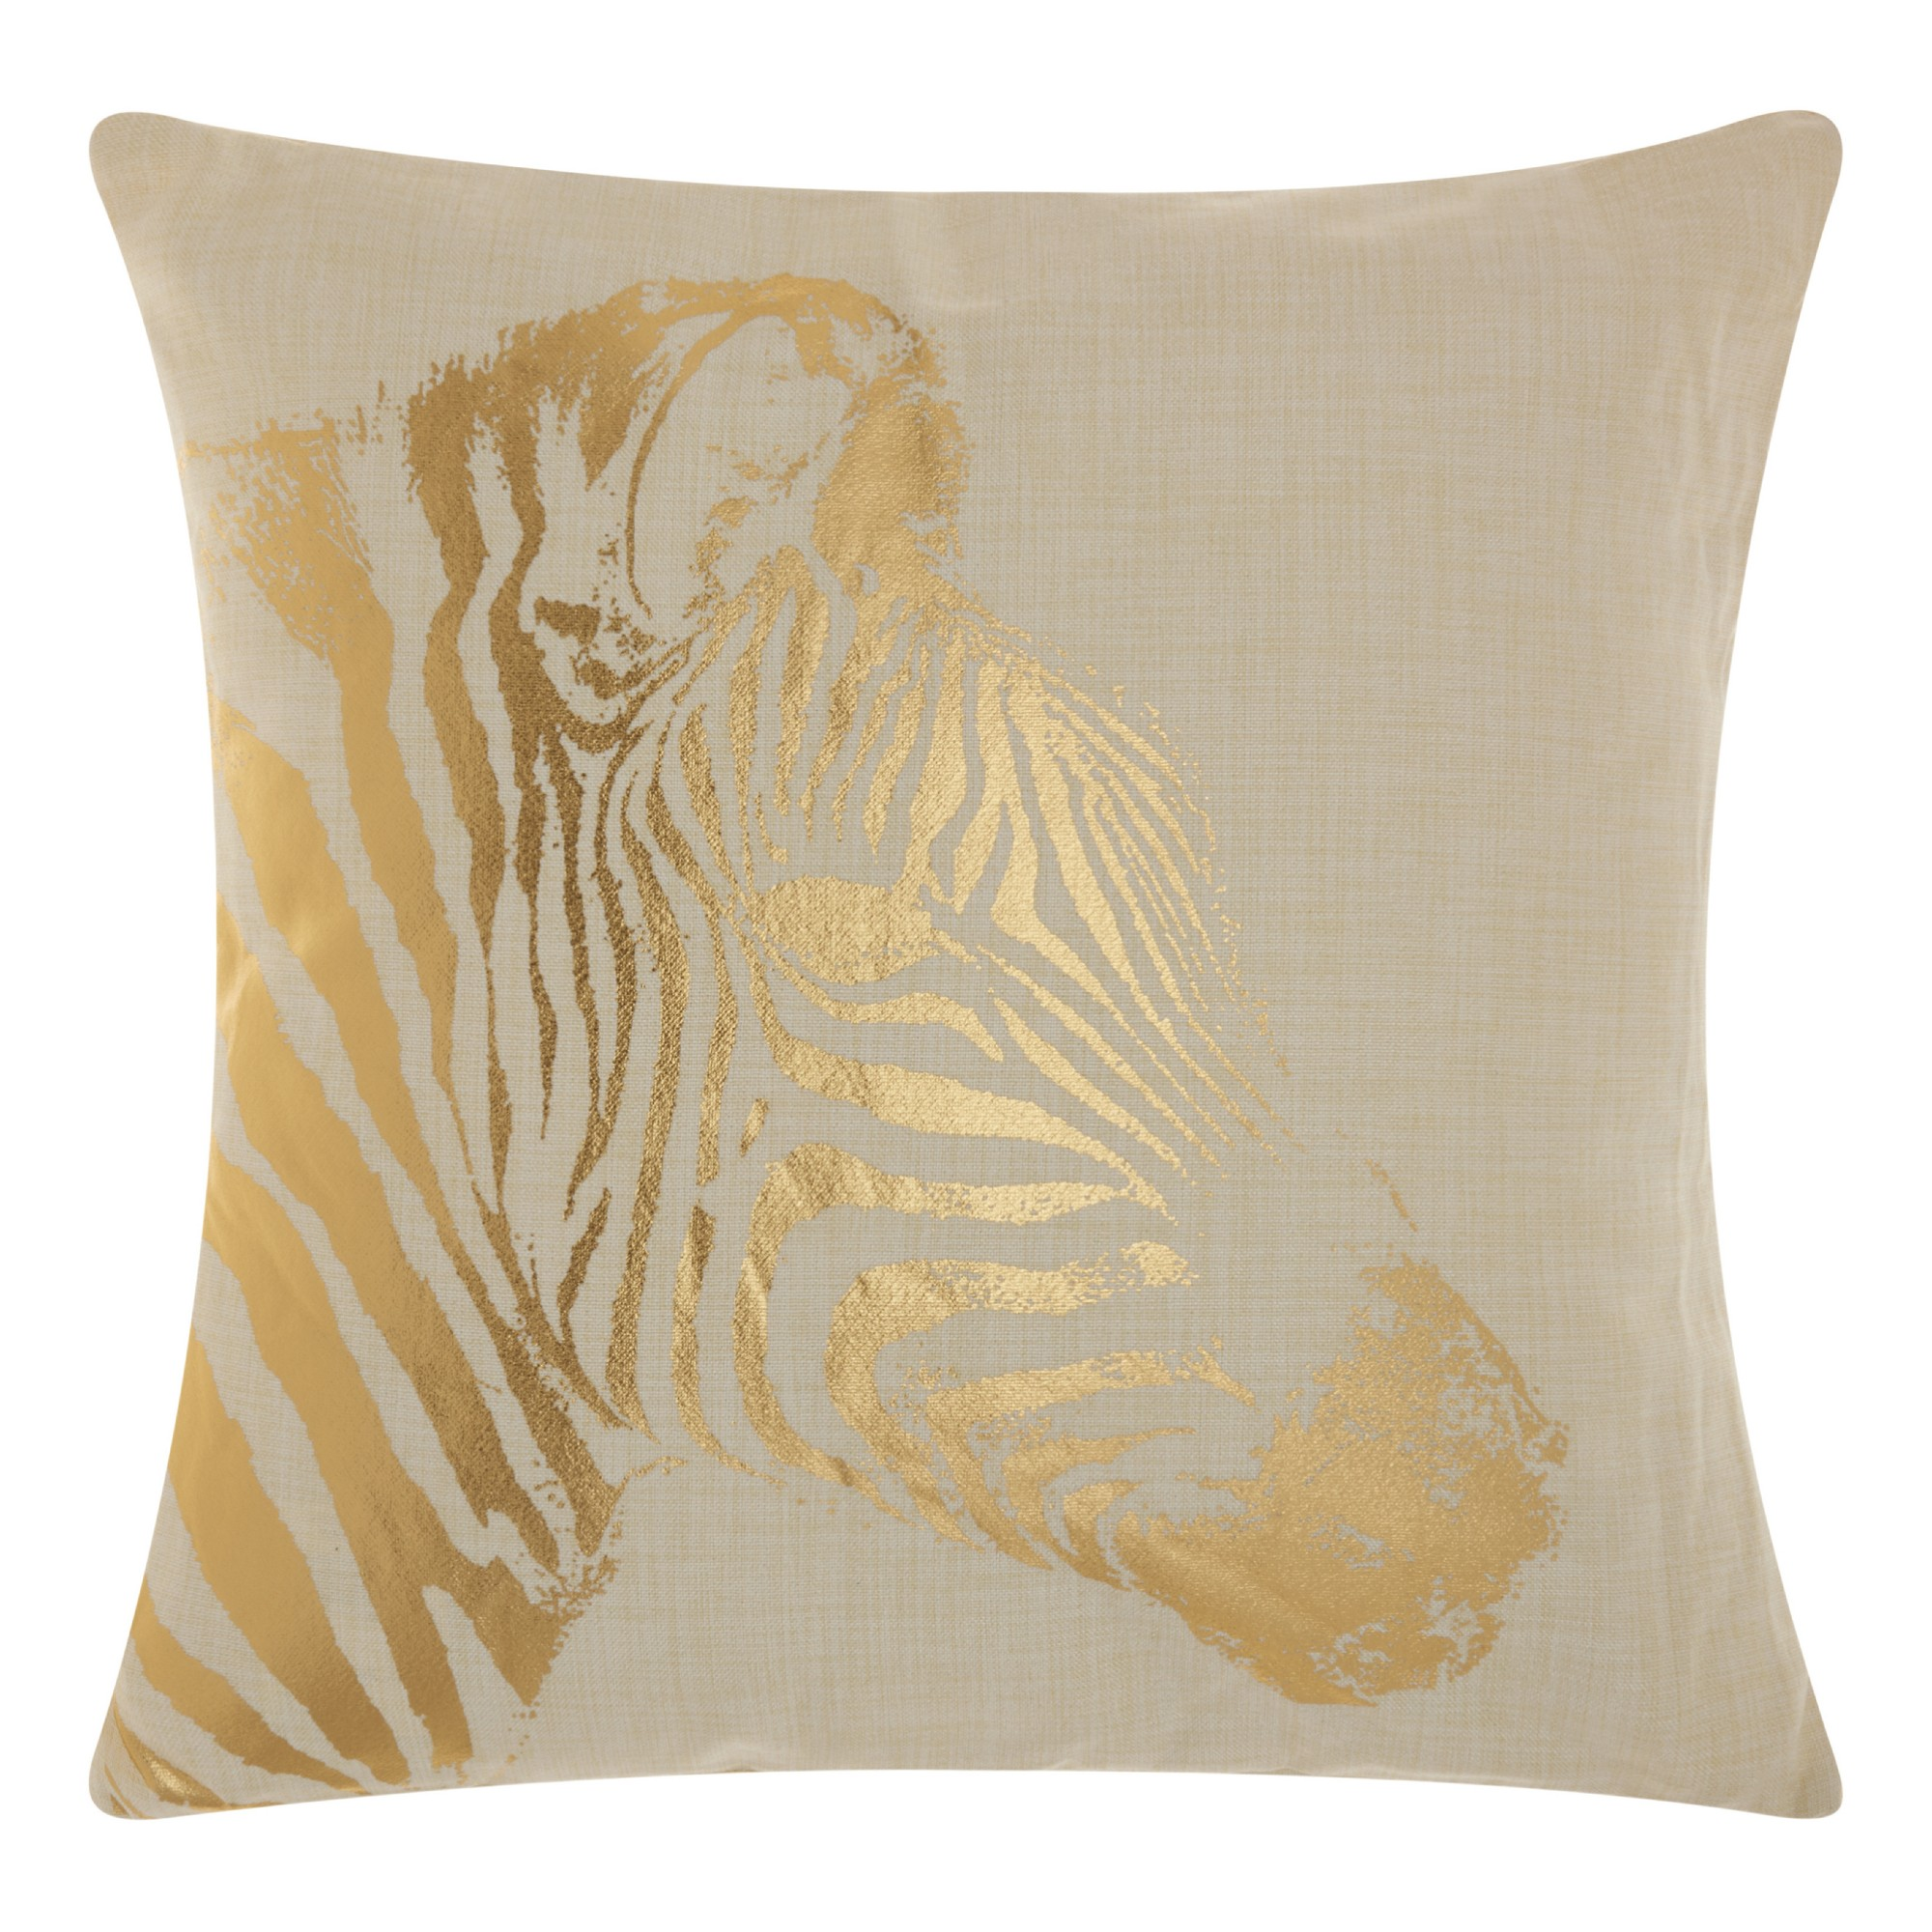 Astonishing Light Gold Zebra Stripe Throw Pillow Mina Victory Uwap Interior Chair Design Uwaporg